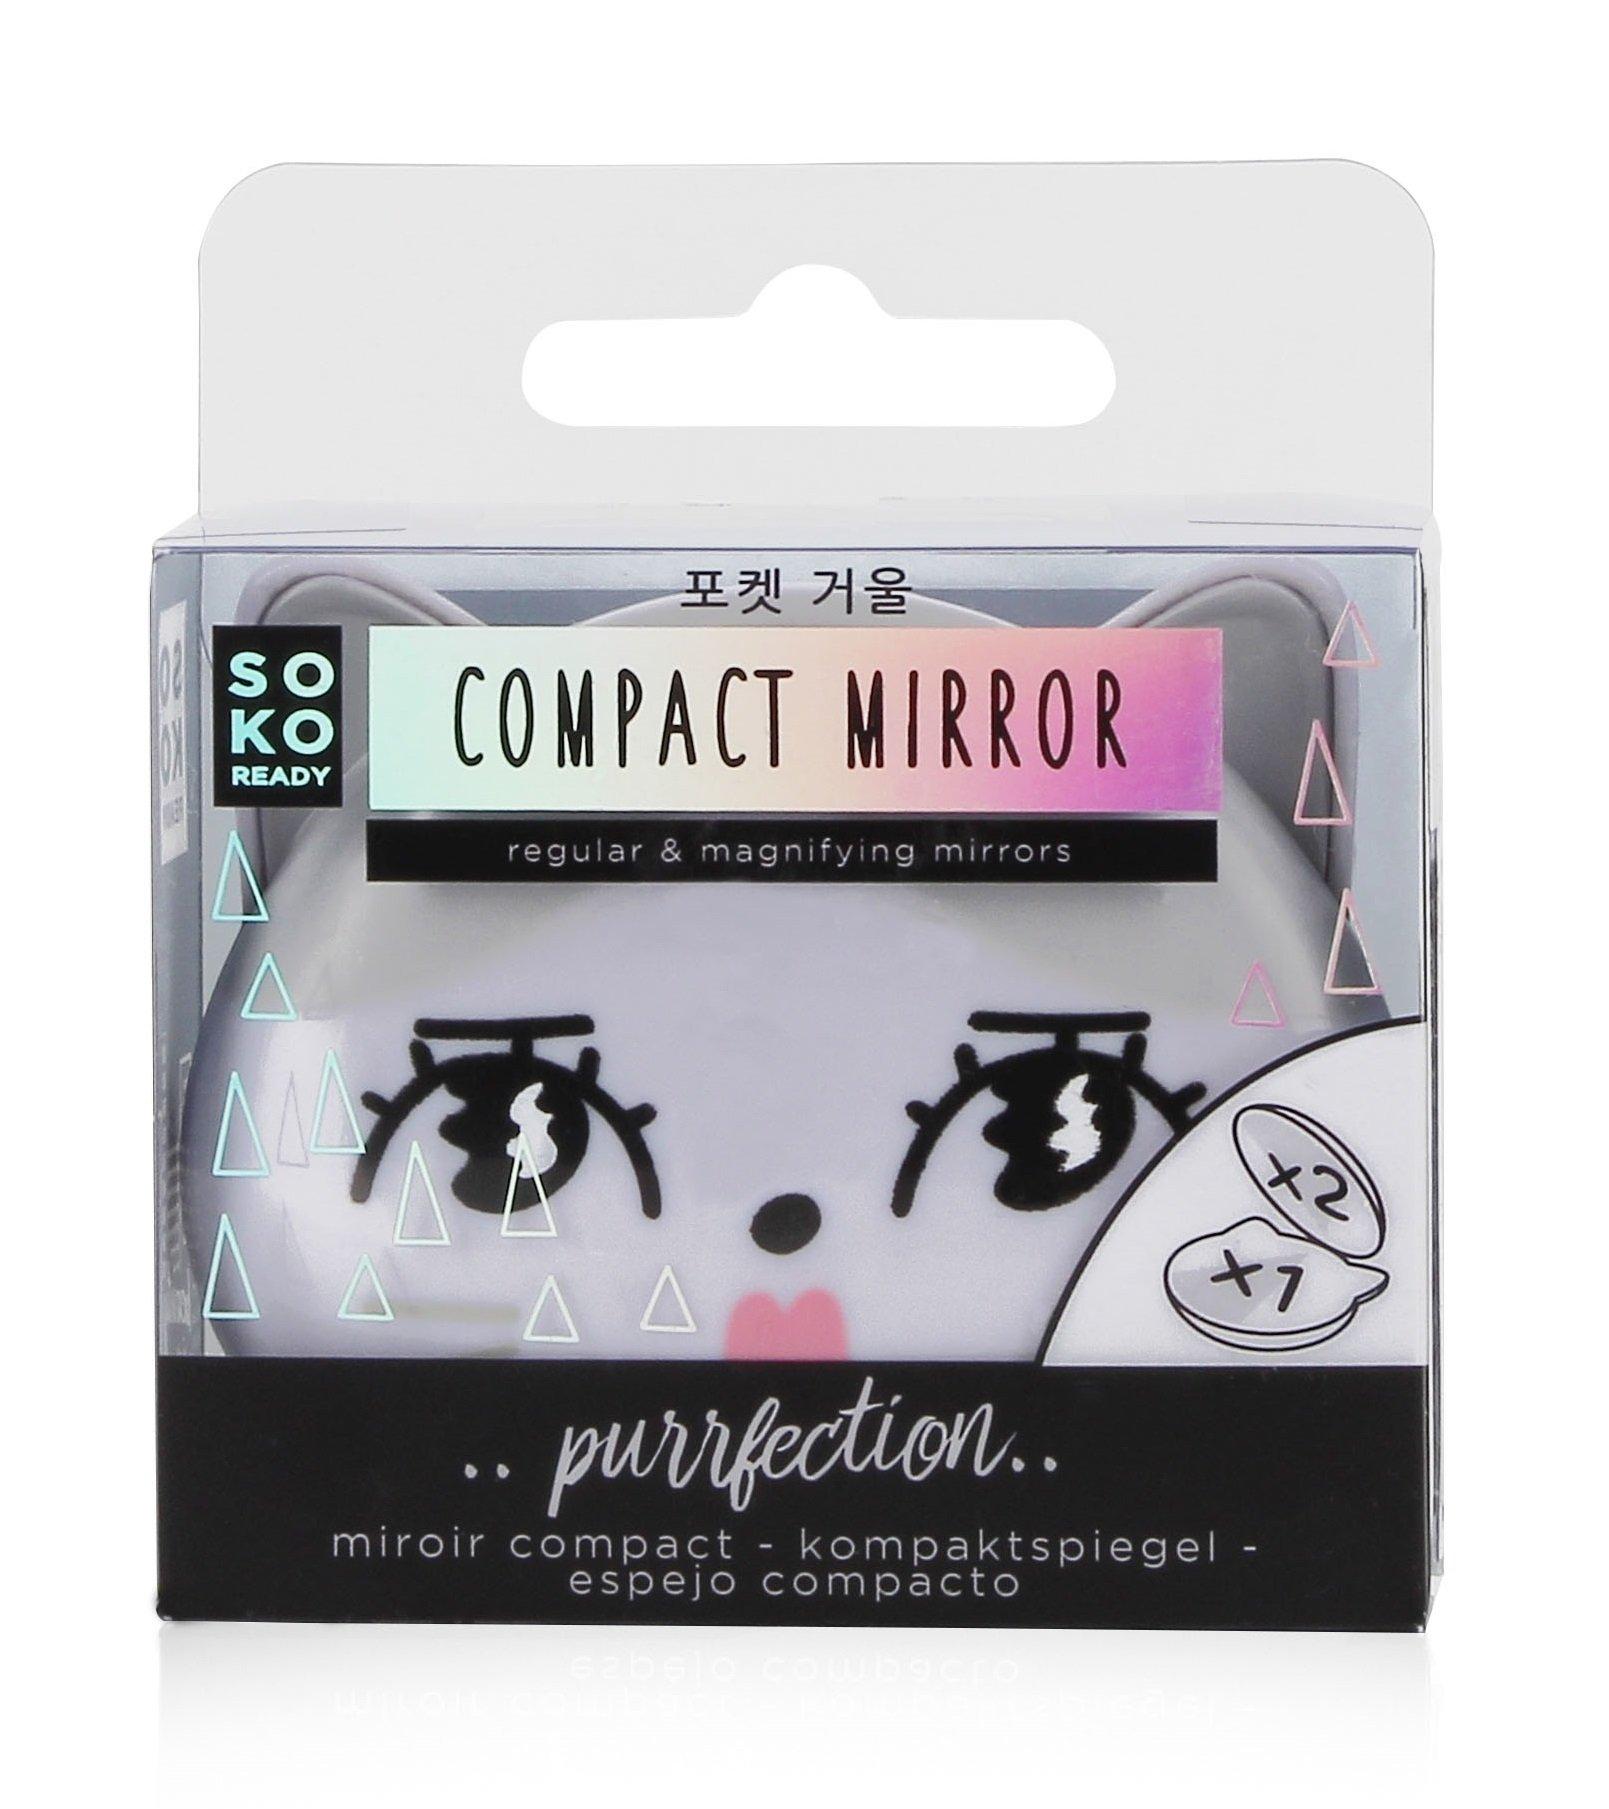 SOKO Ready Compact Pocket Mirror